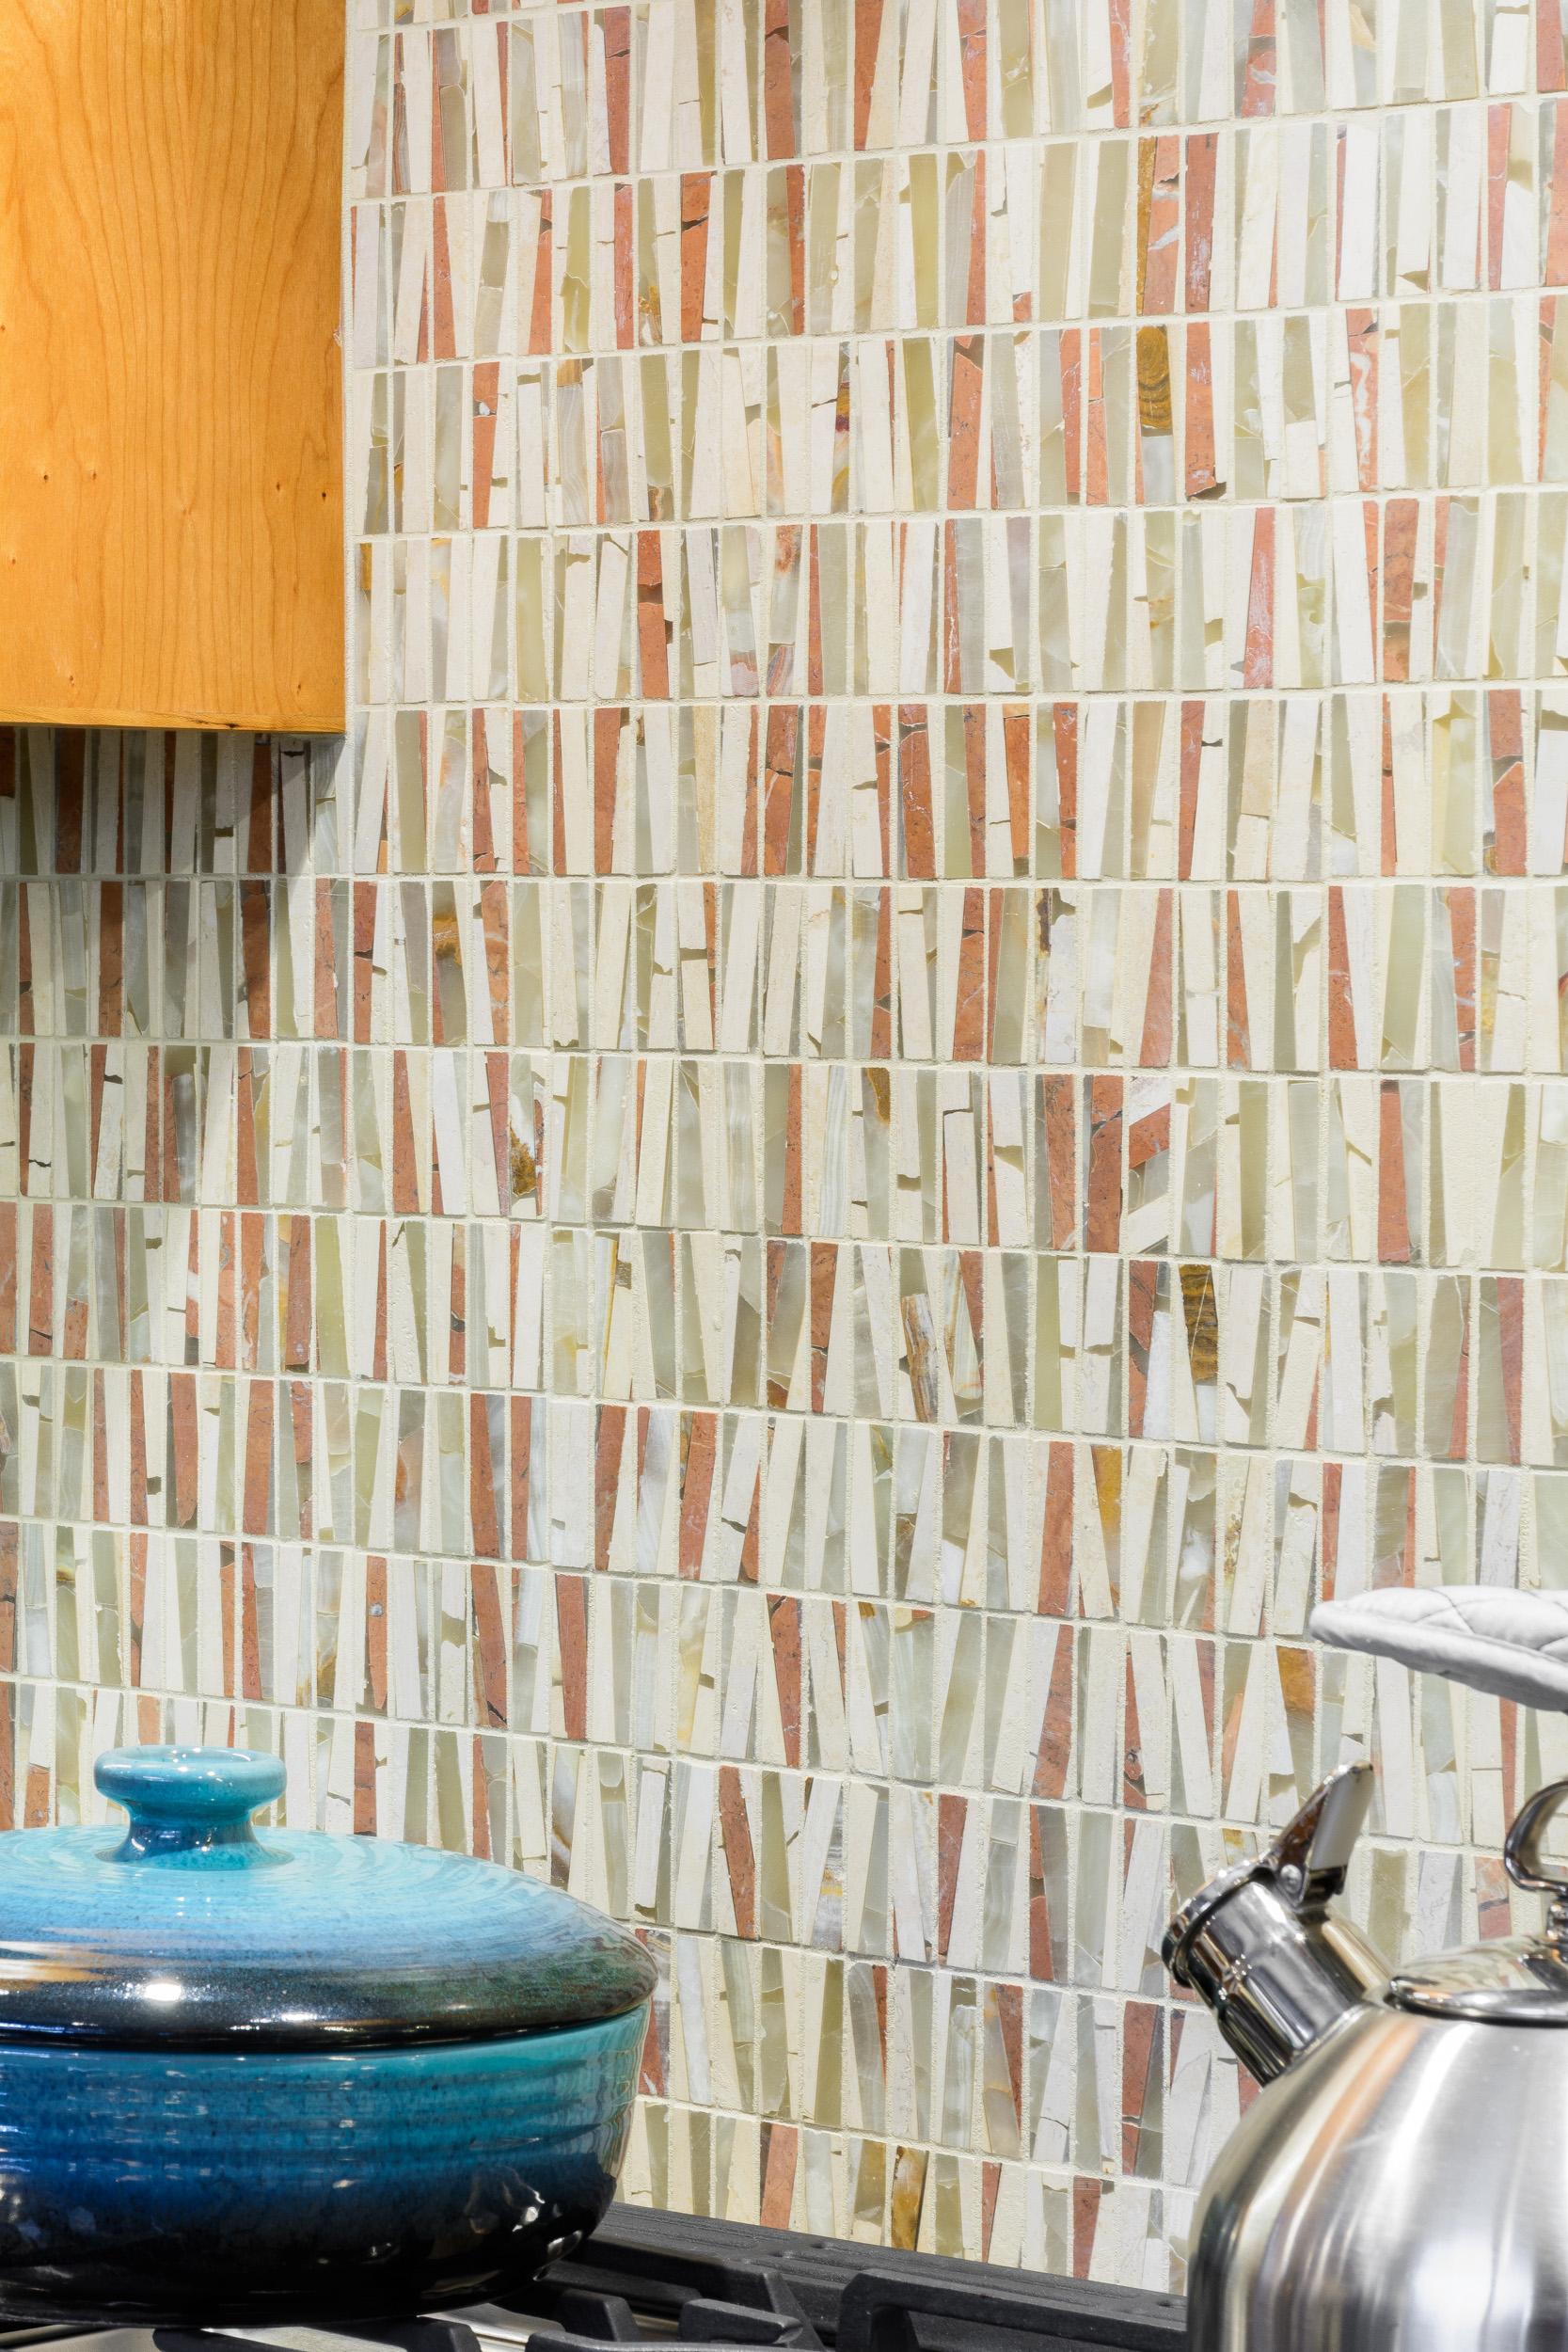 This mosaic tile backsplash over the kitchen range offers a distinctive design